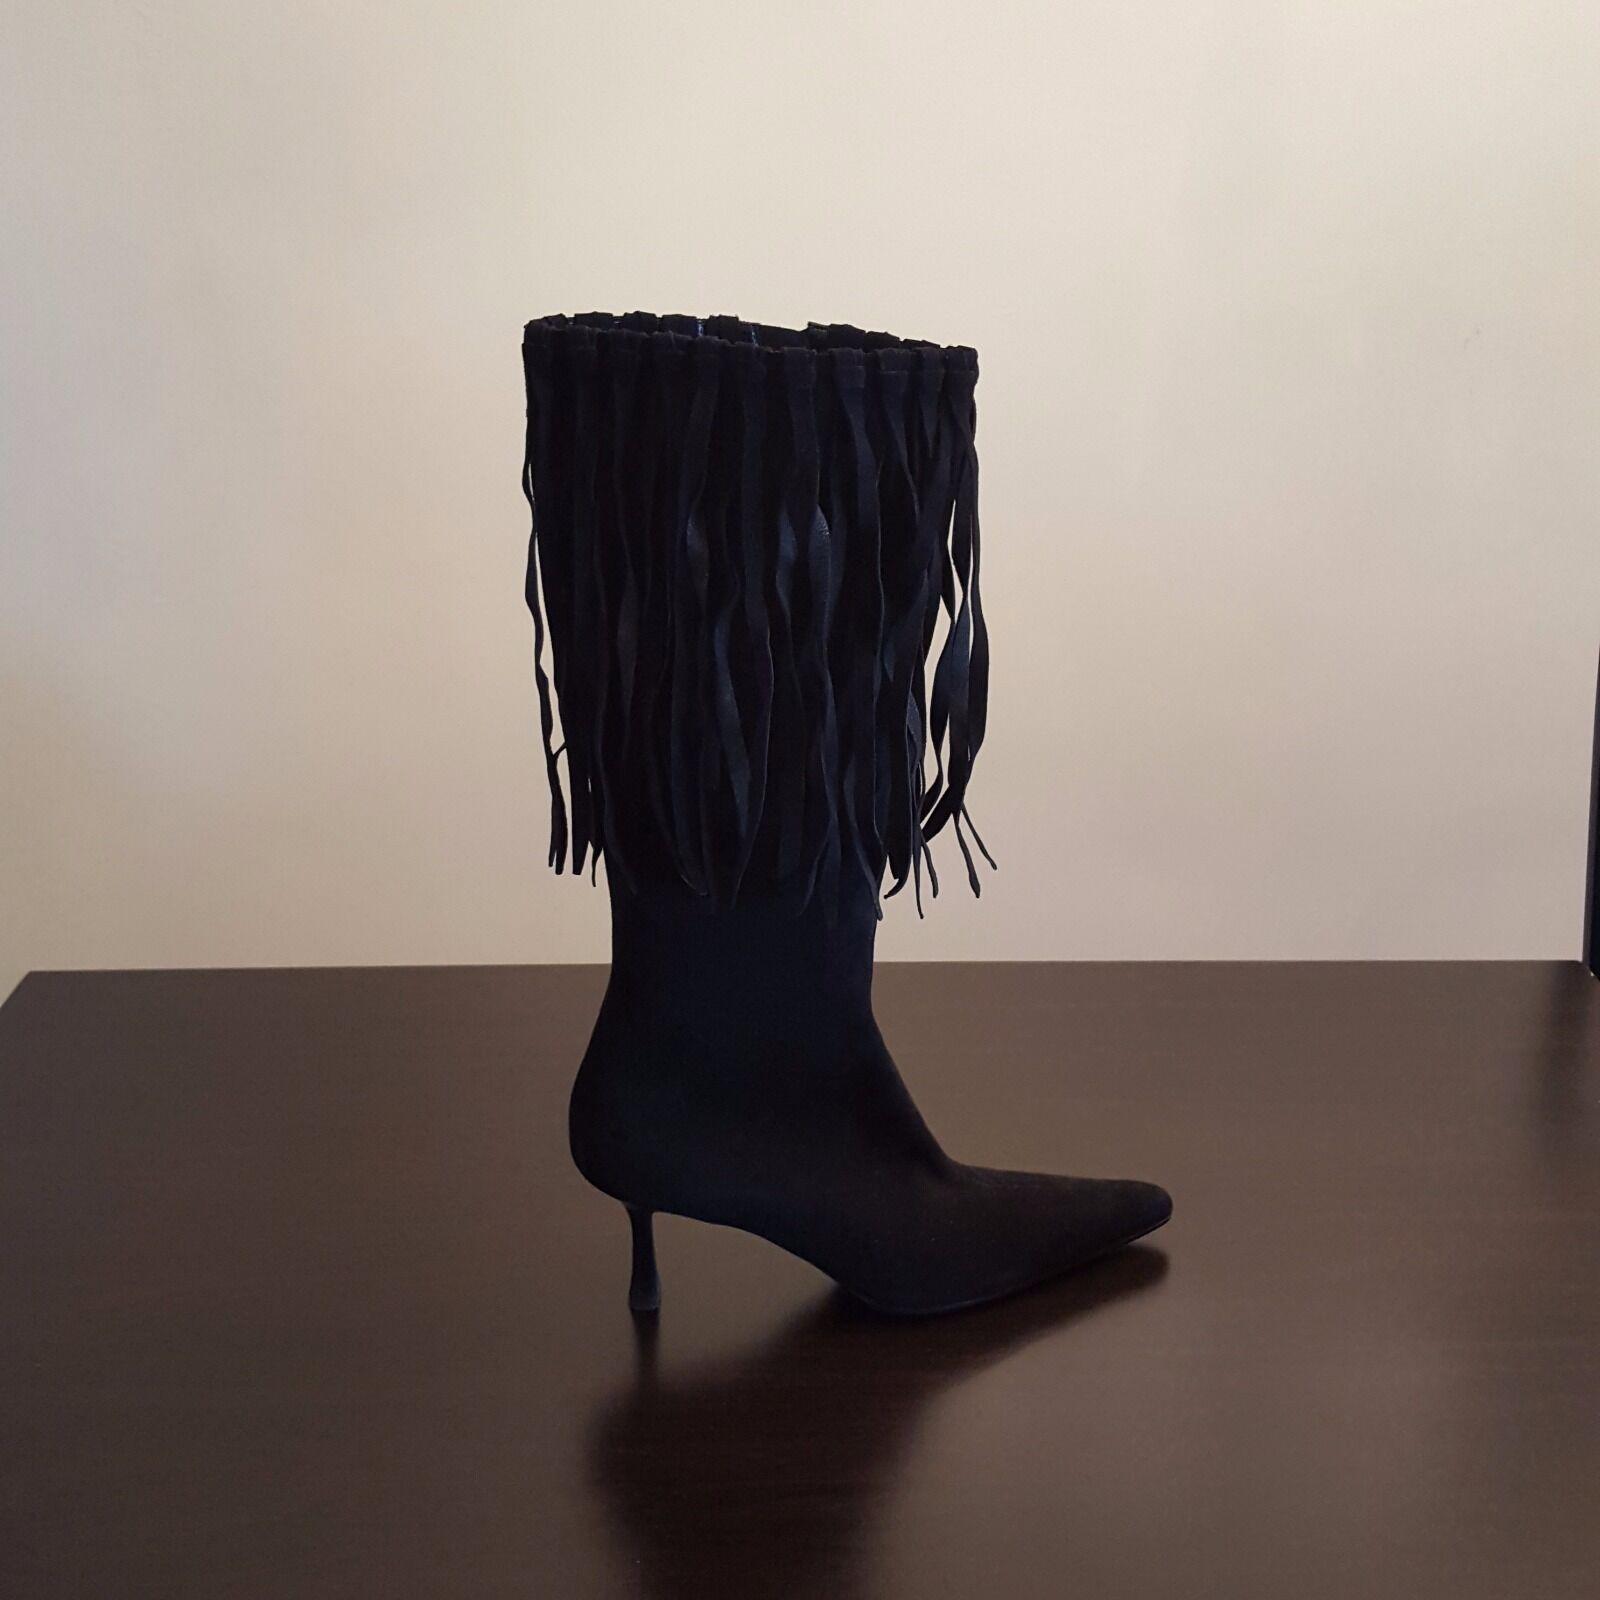 BALLINE WOMEN ITALIAN BLACK SUEDE BOOTS WITH FRINGE SIZE 6